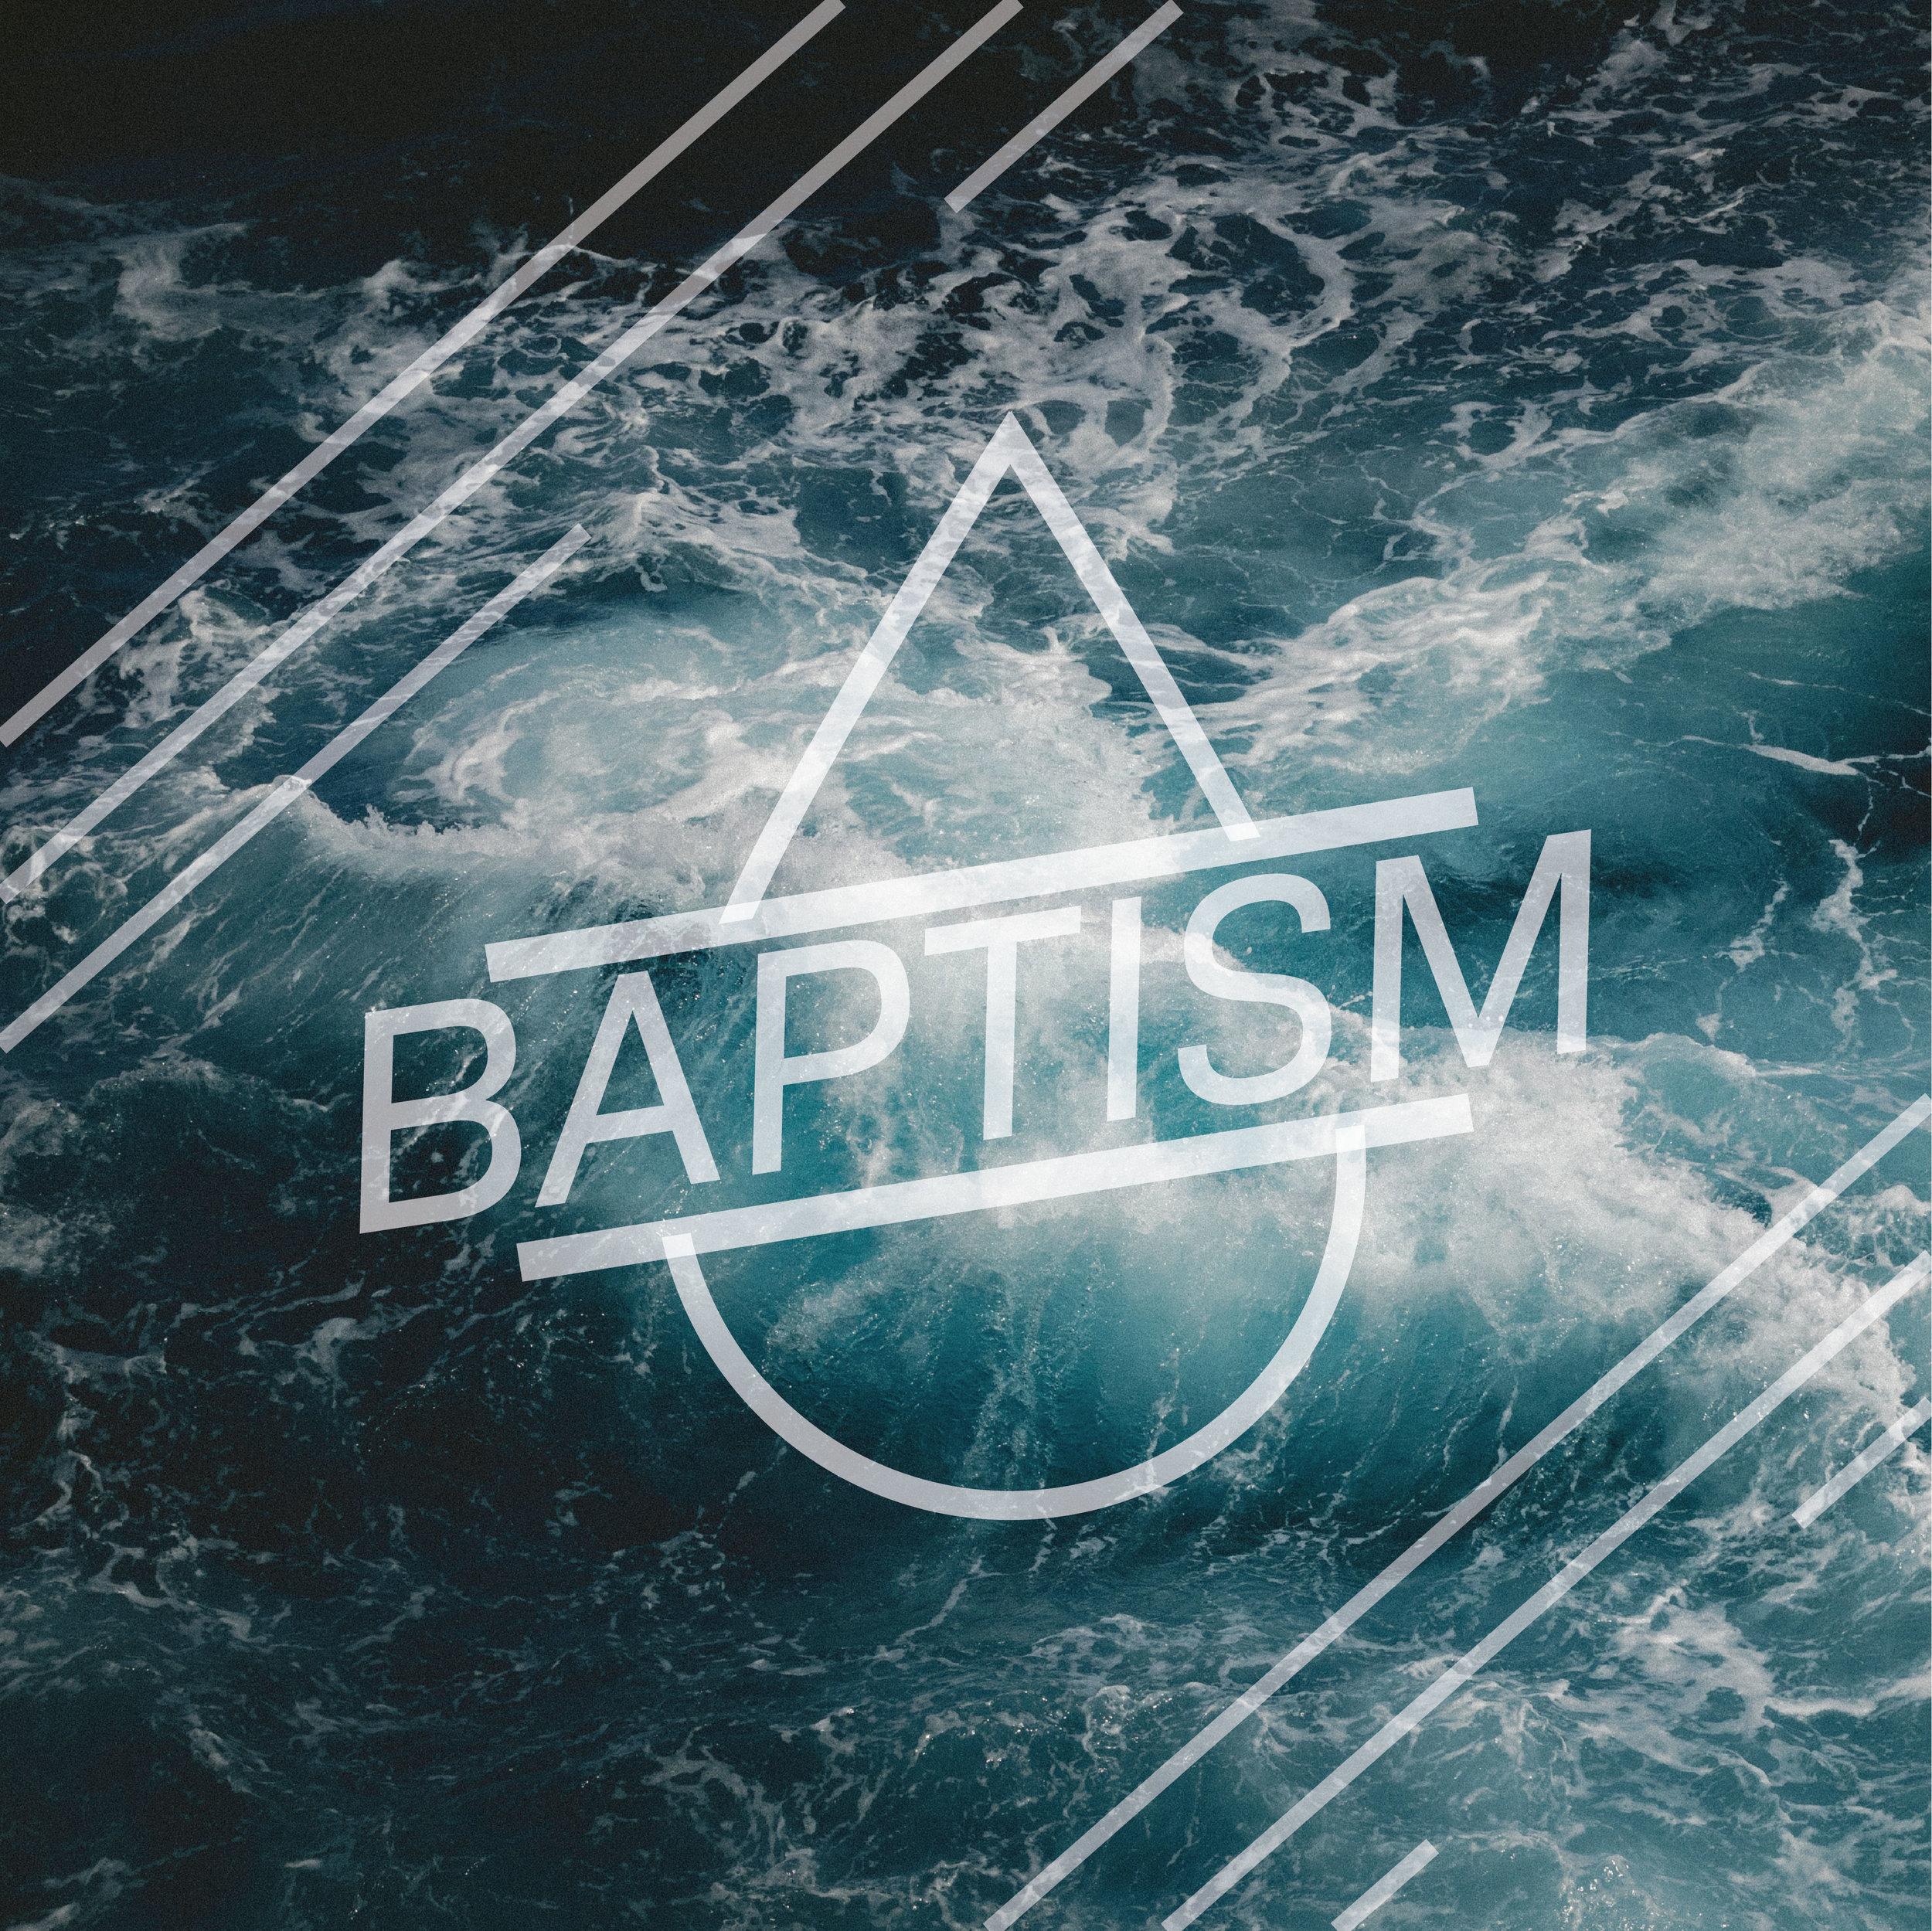 Baptism-1-07.jpg